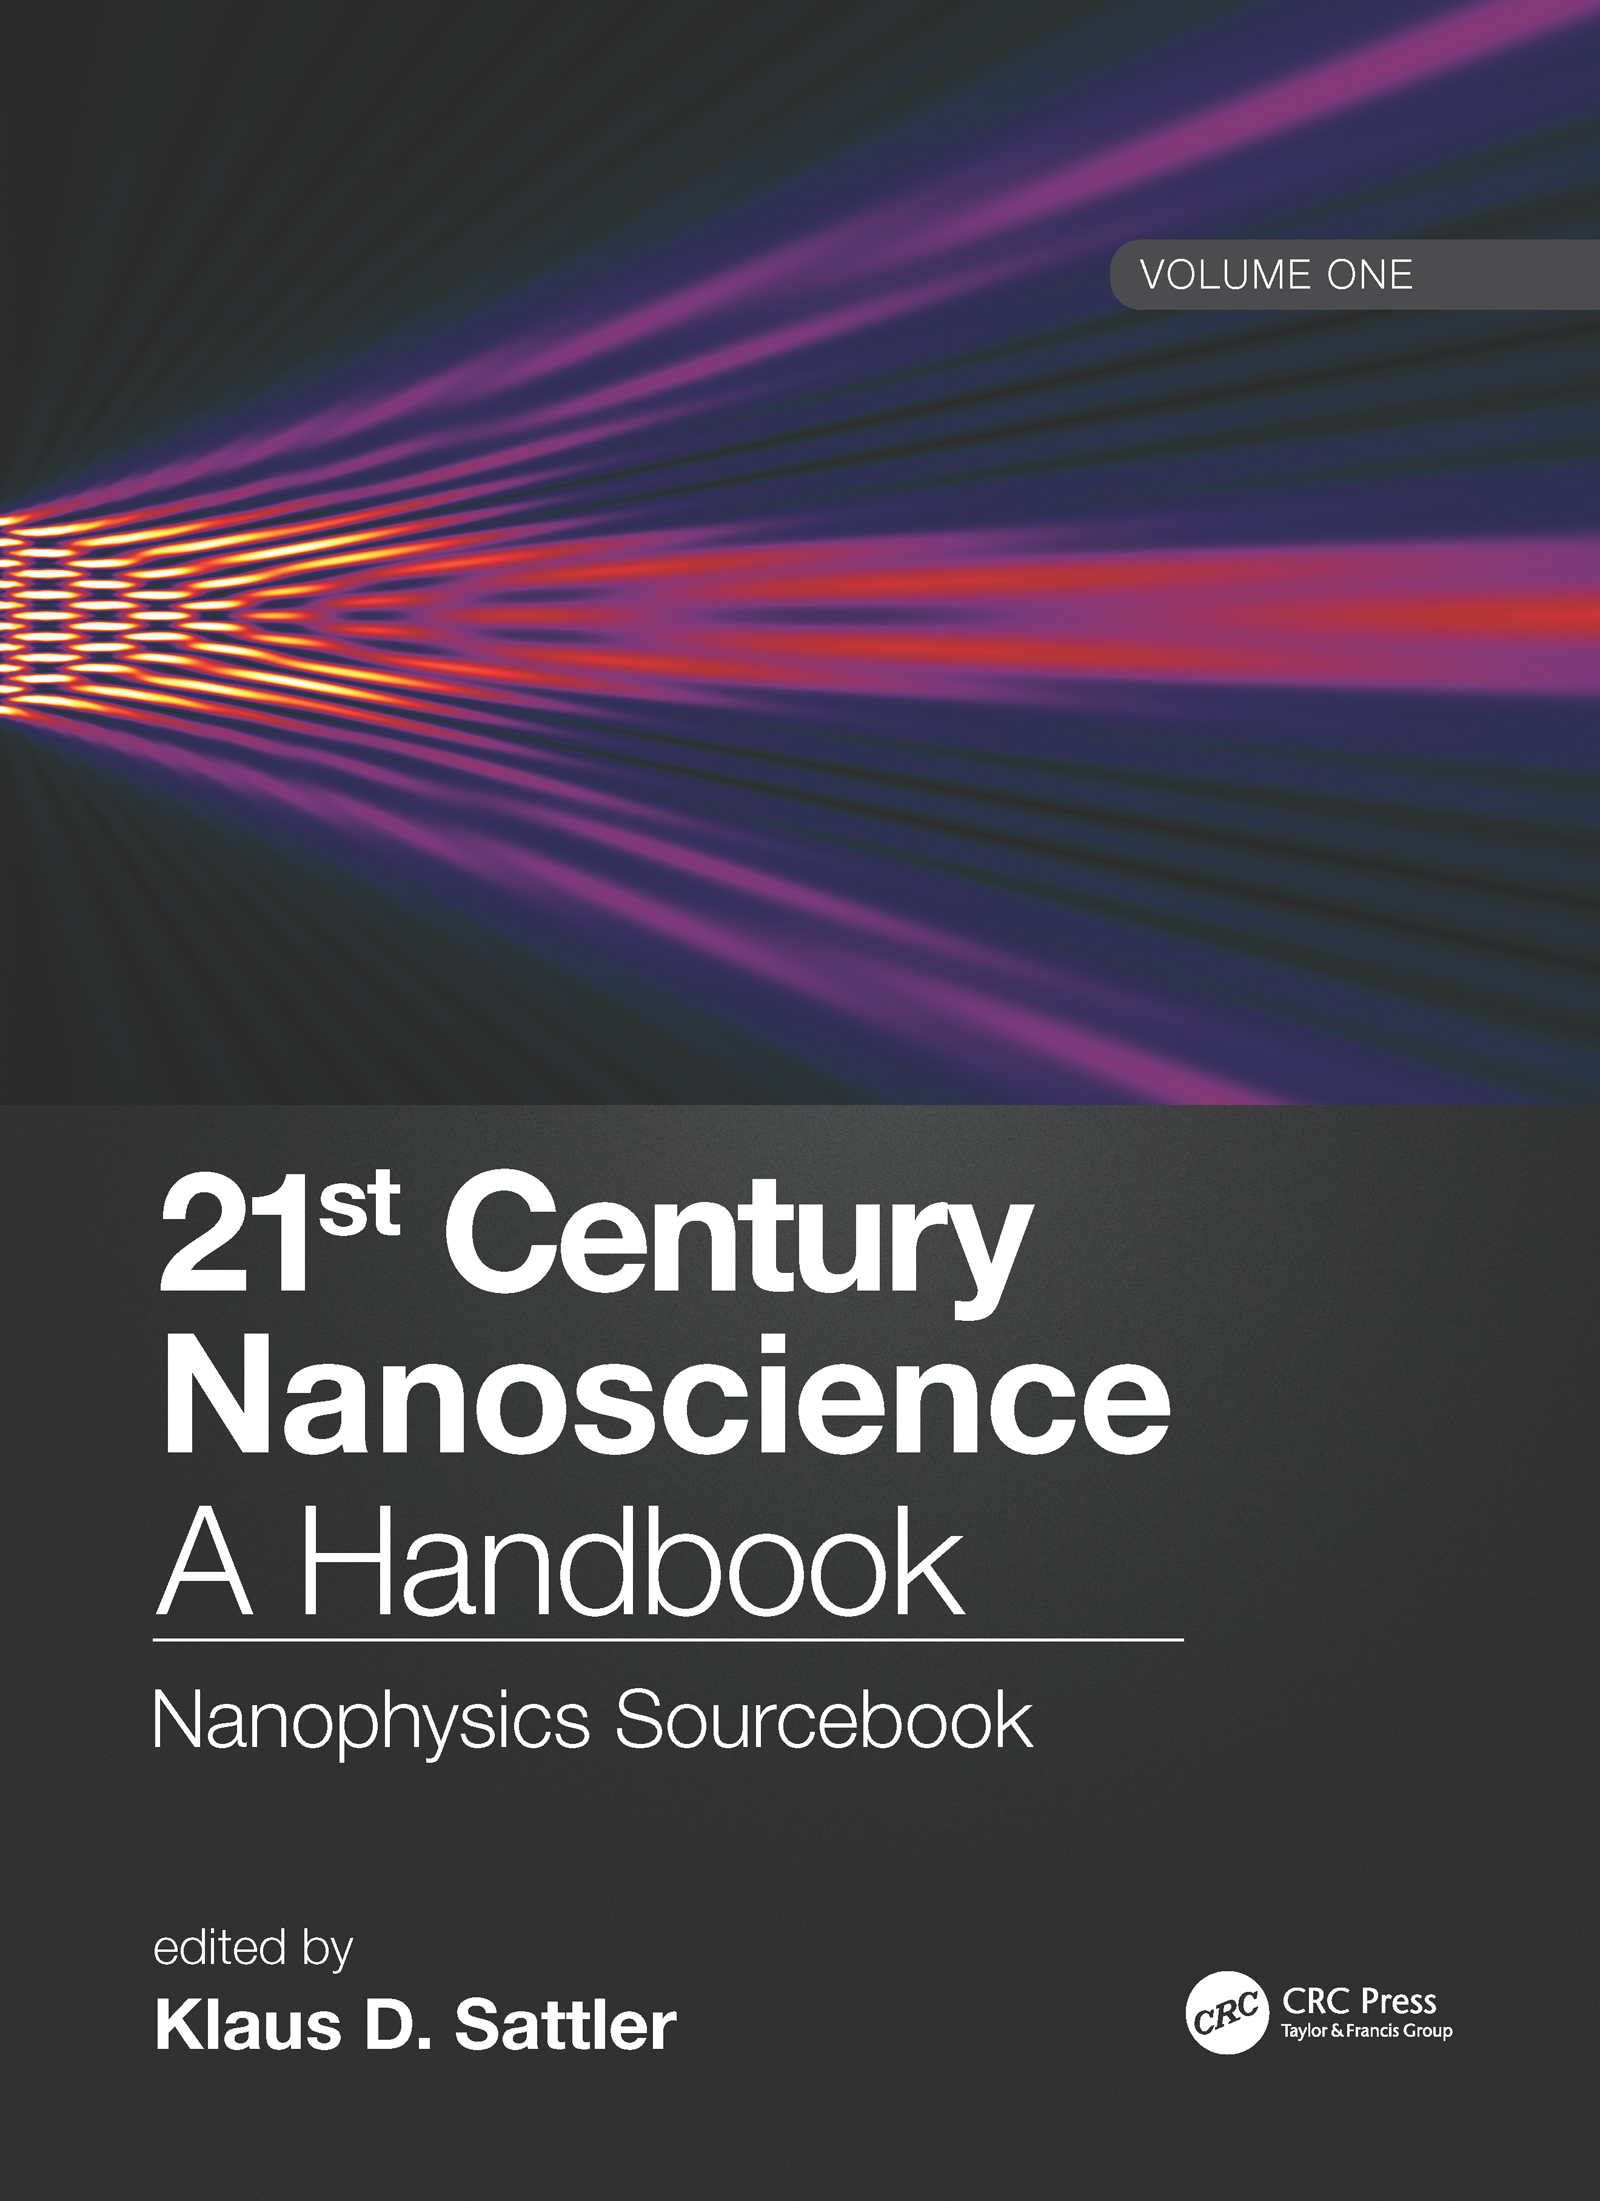 21st Century Nanoscience – A Handbook: Nanophysics Sourcebook (Volume One) book cover